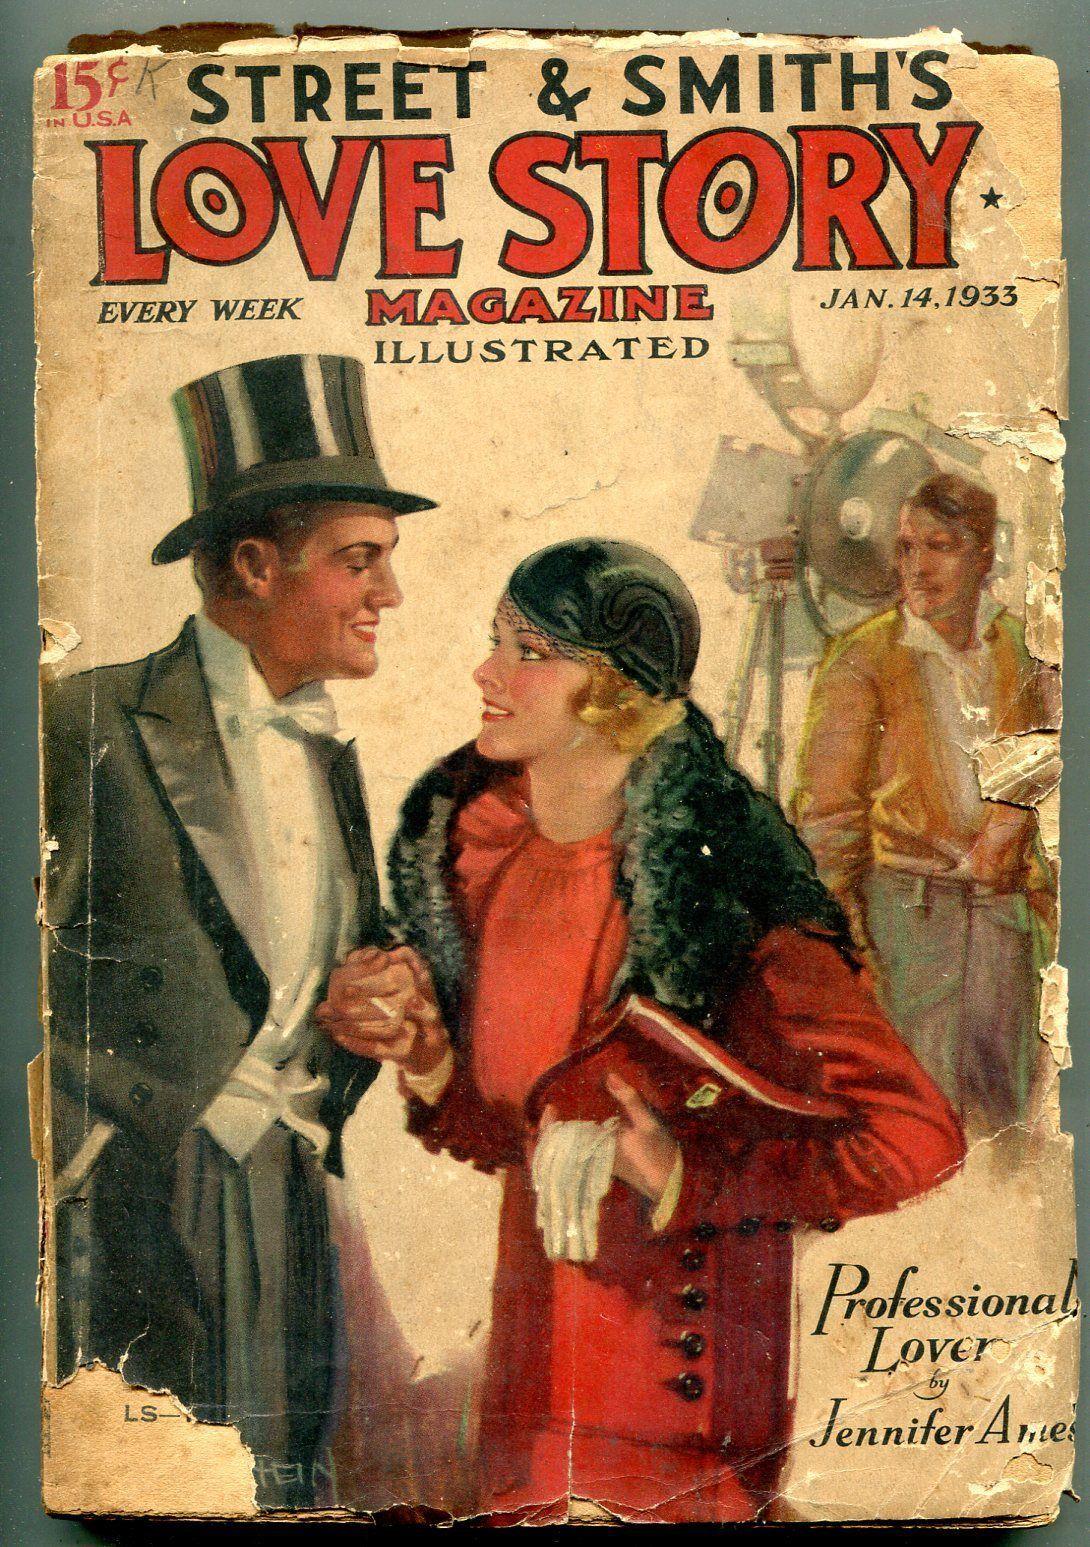 Love Story Magazine January 14 1933-Romance Pulp reading copy - $44.14